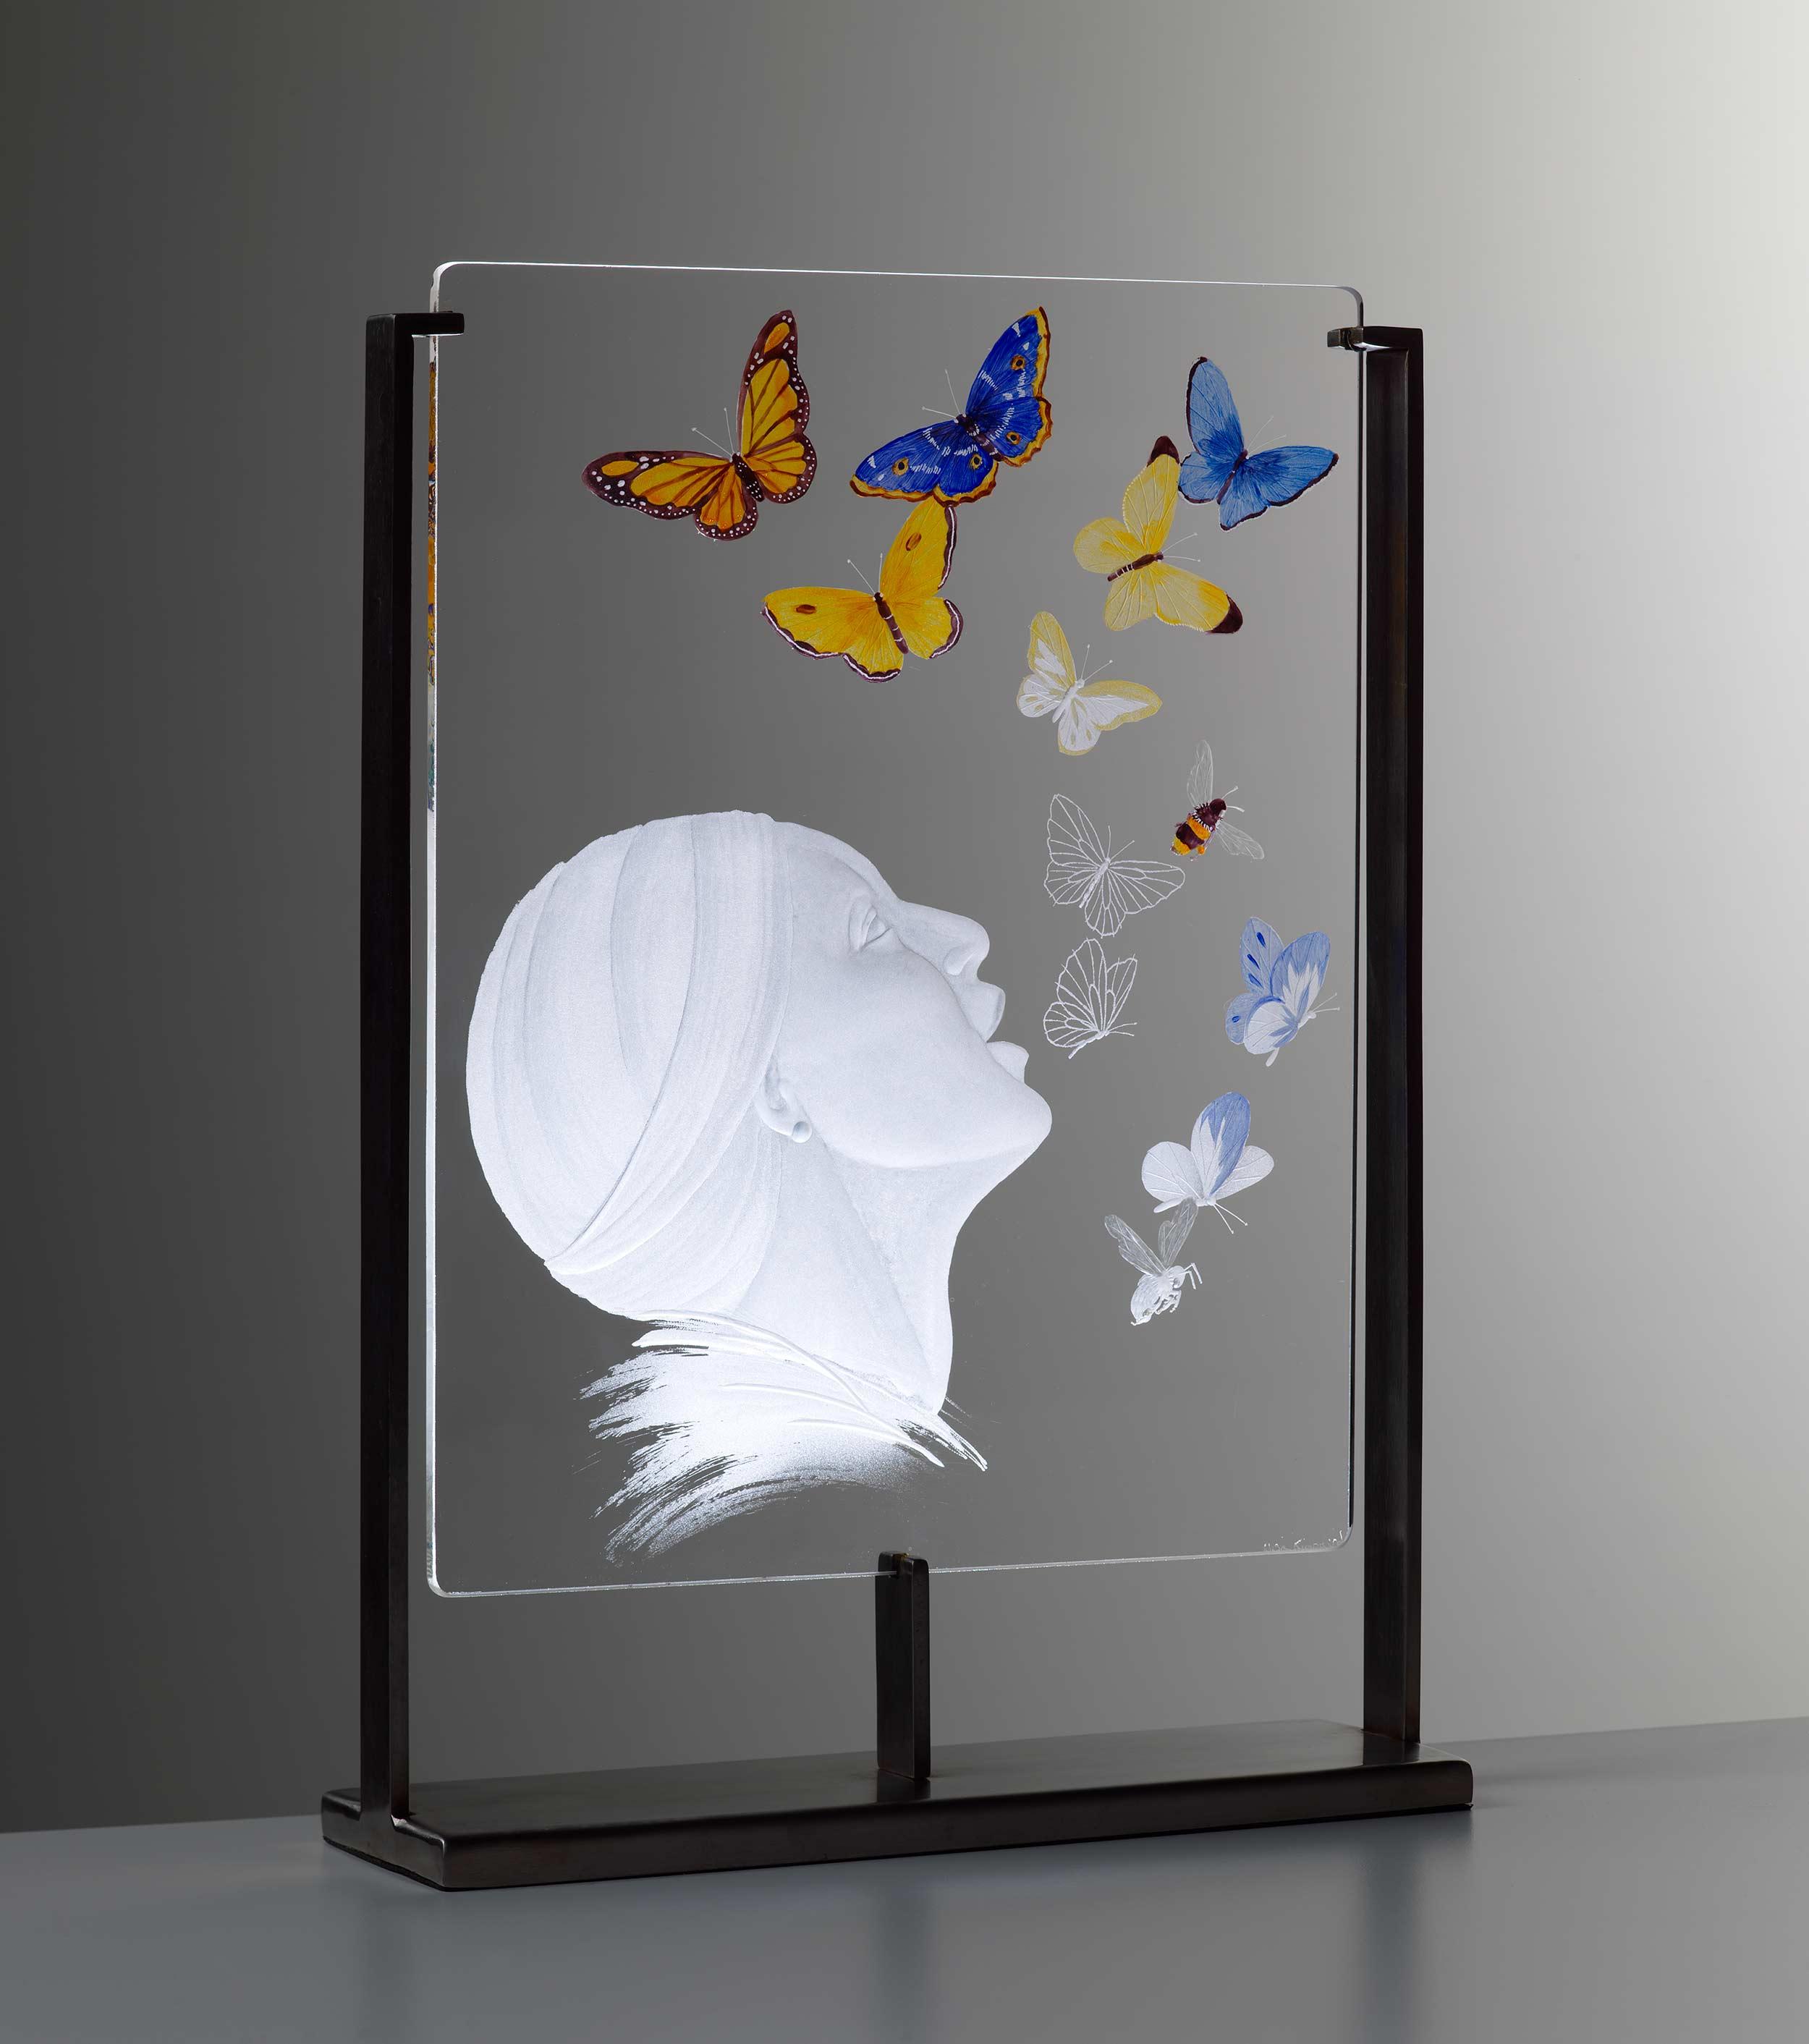 Alison.Kinnaird.MBE-The.Singer-engraved.glass-photo.Shannon.Tofts.jpg